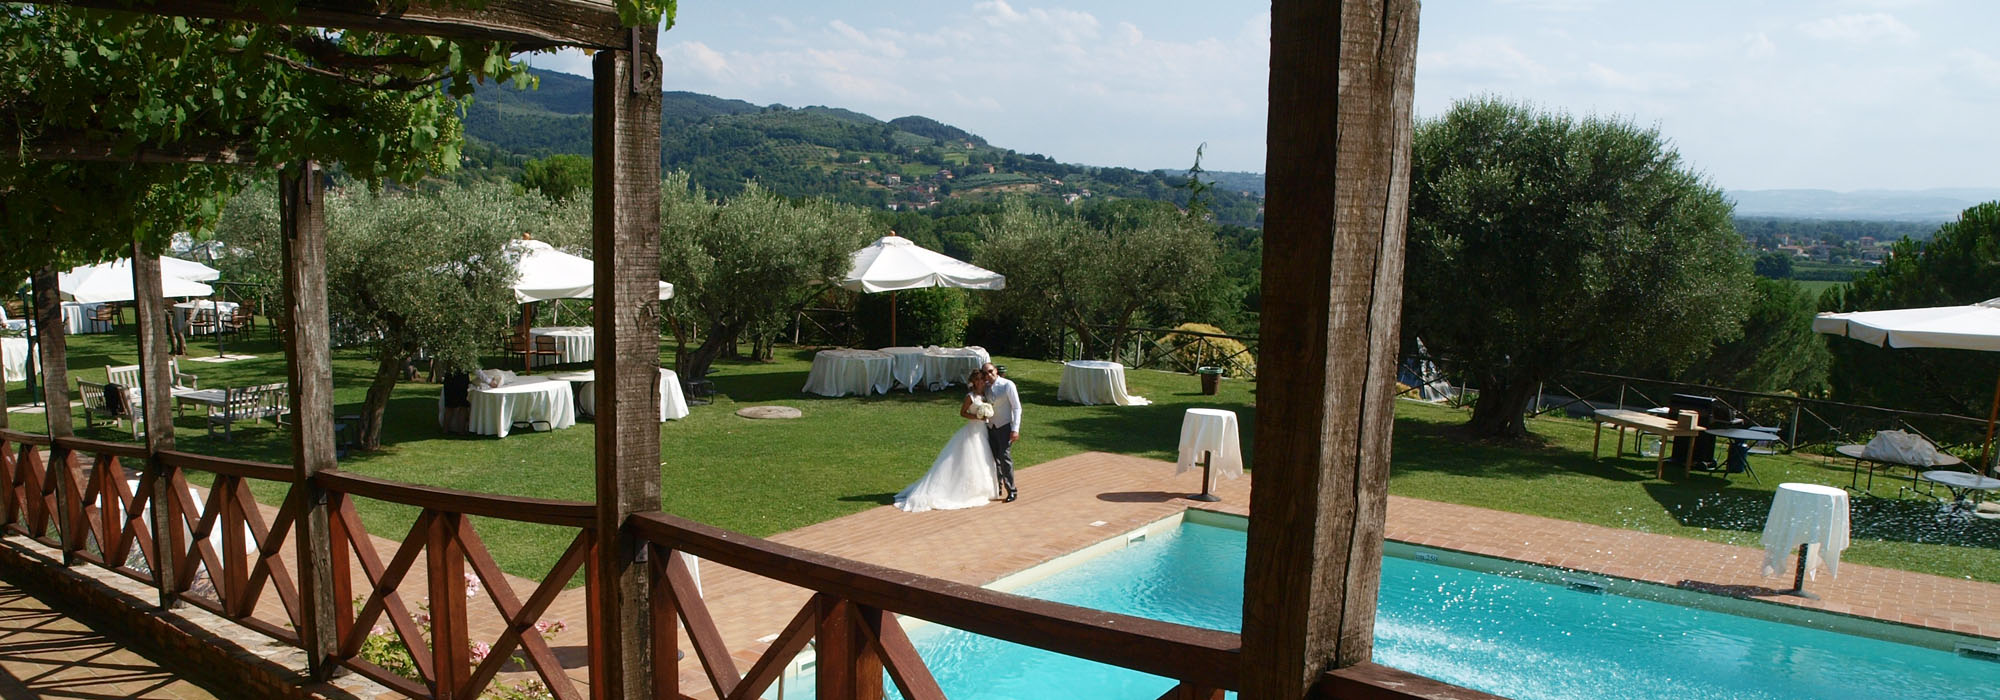 Matrimoni-Tre-Vaselle